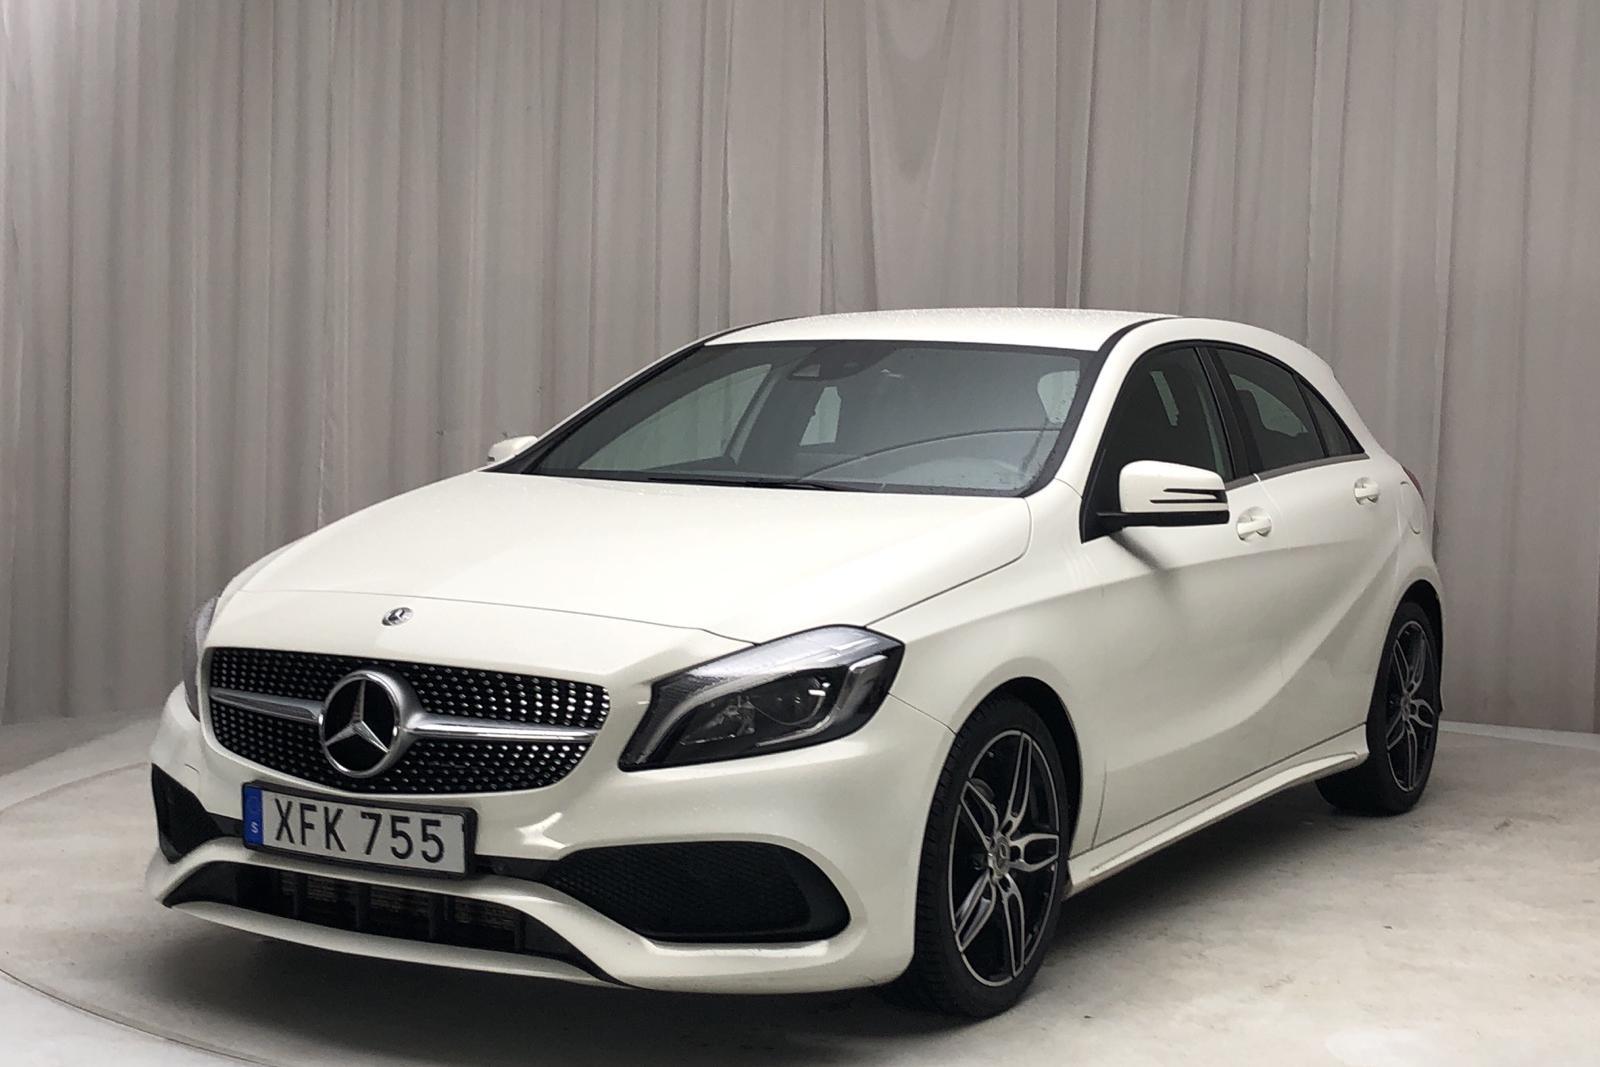 Mercedes A 180 5dr W176 (122hk) - 9 418 mil - Manuell - vit - 2018